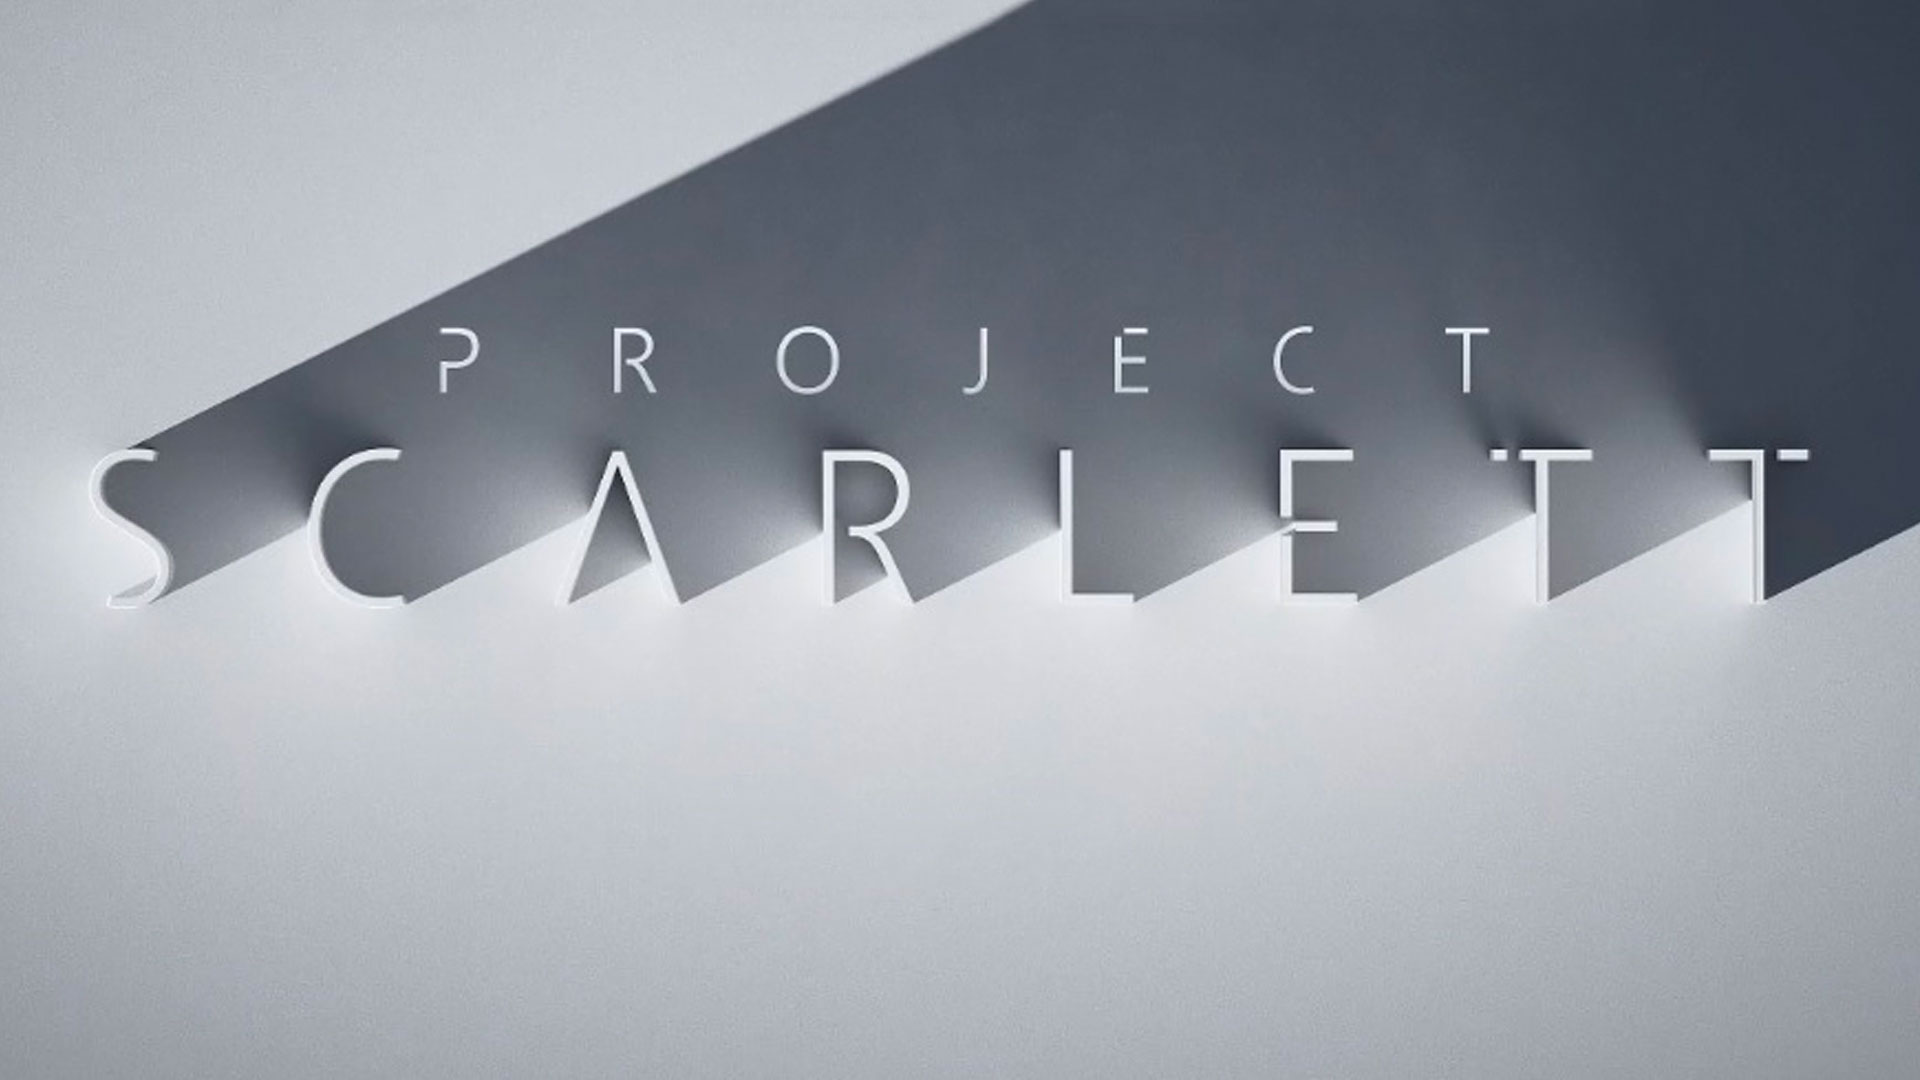 xbox-project-scarlett-anaconda